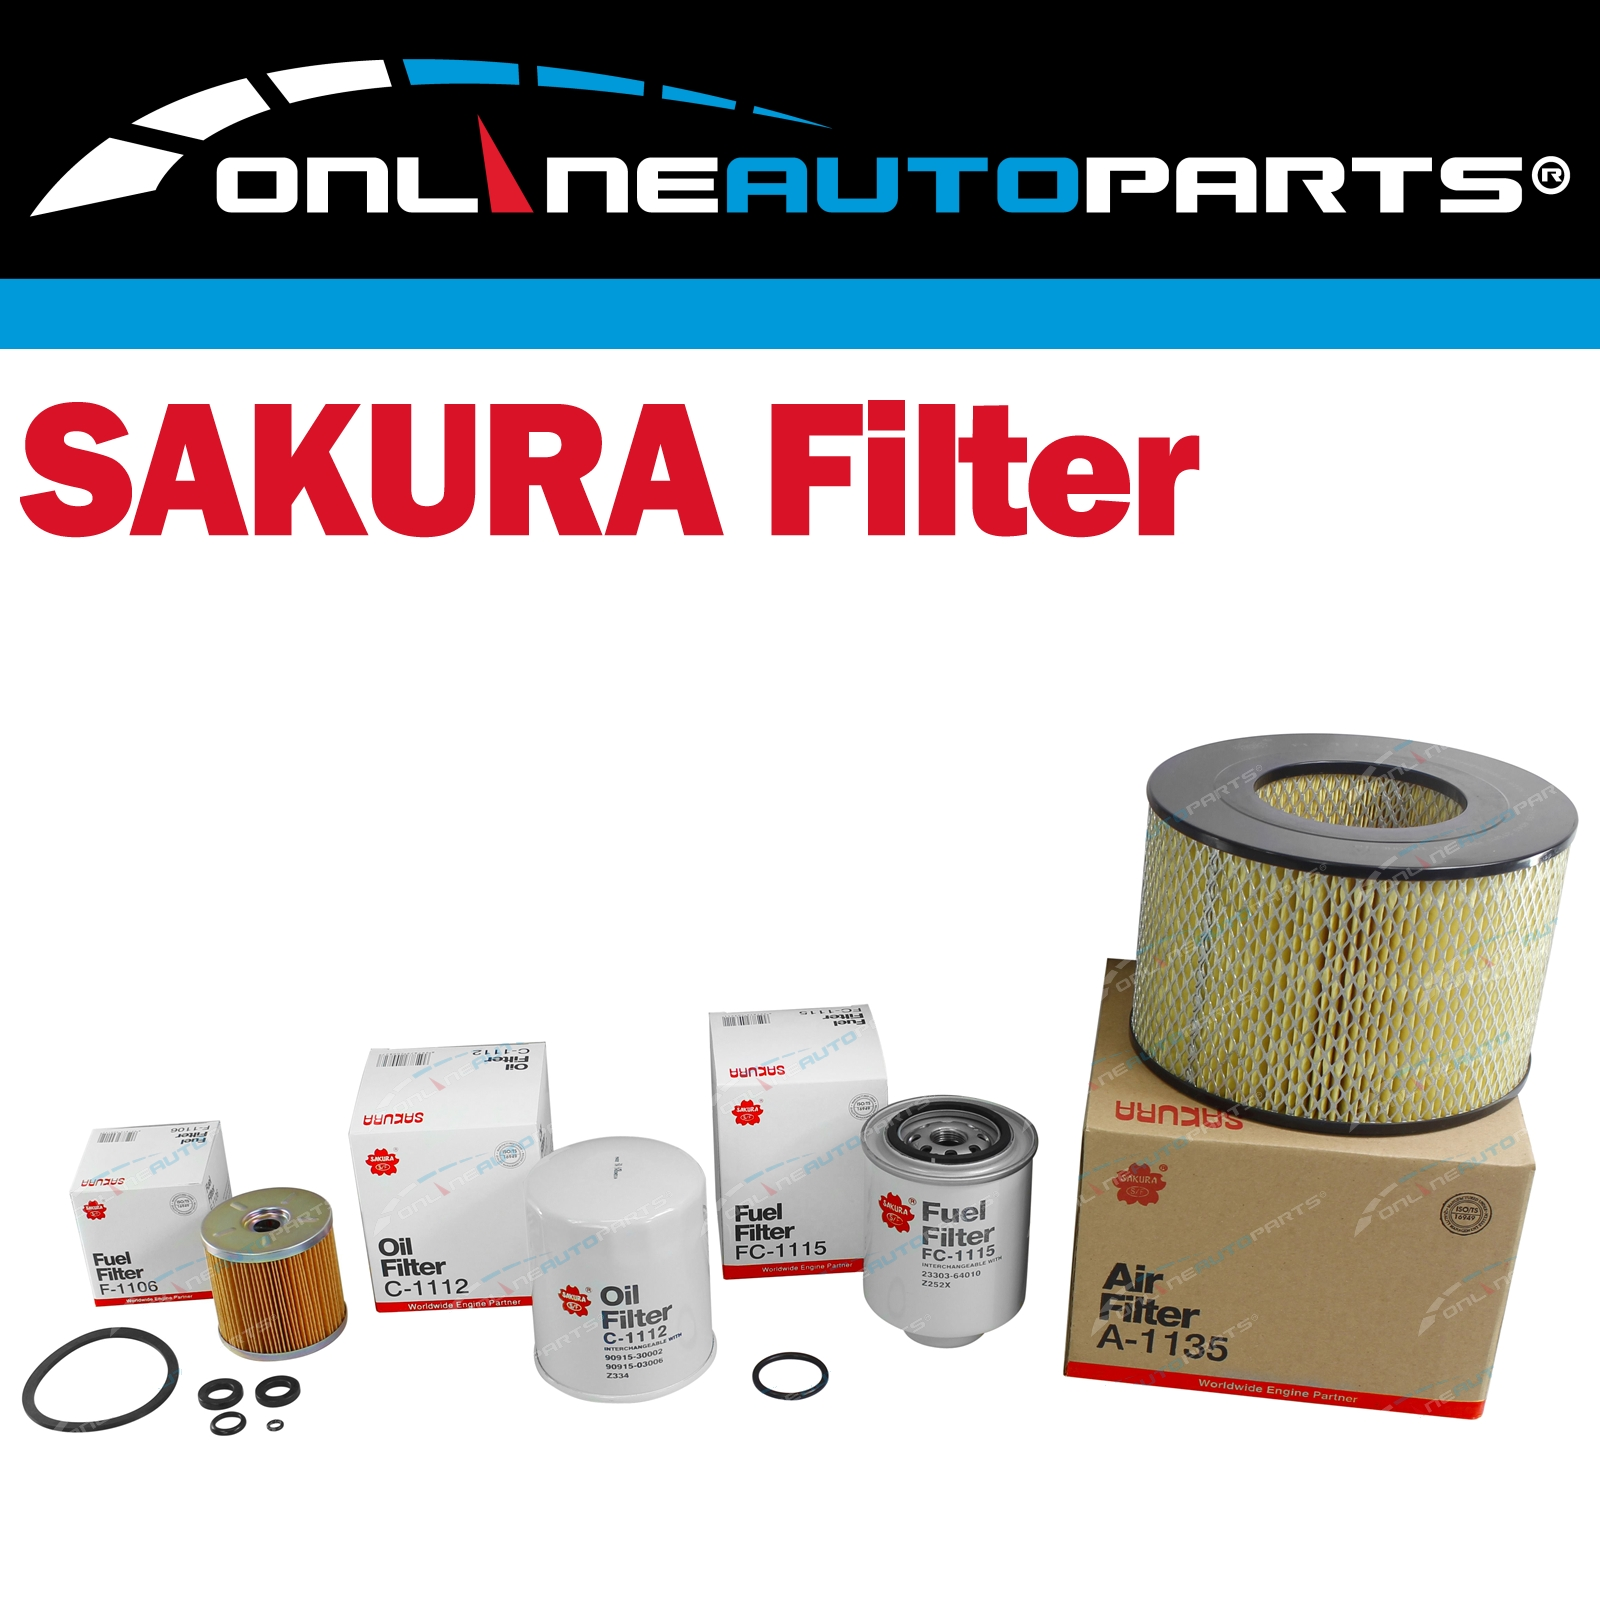 K-11030 Sakura 4x4 Filter Service Kit